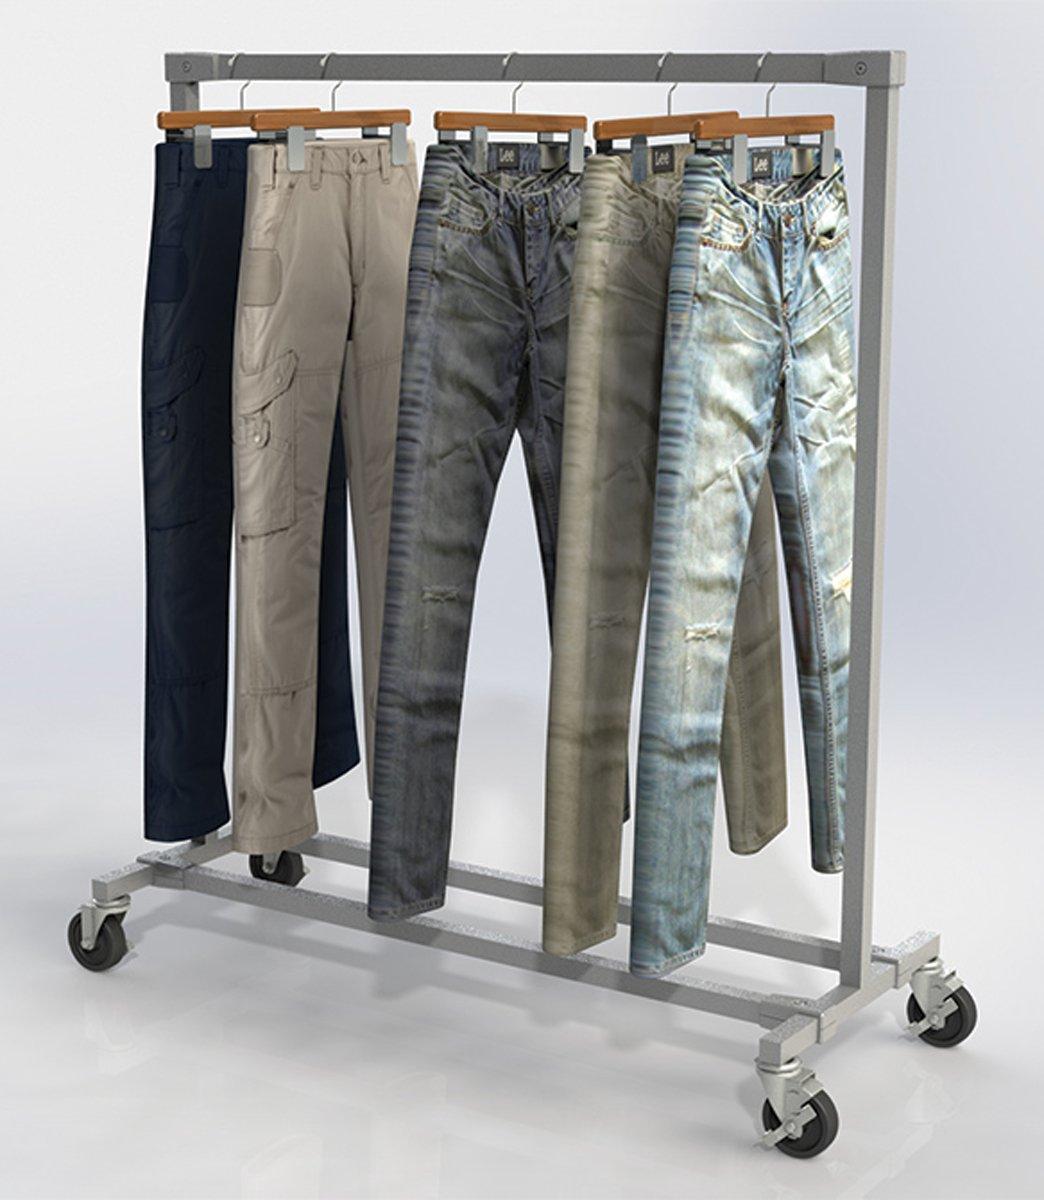 Burnside Garment Display Ballet Metal Bar Rack Retail Store Clothing Fixture NEW